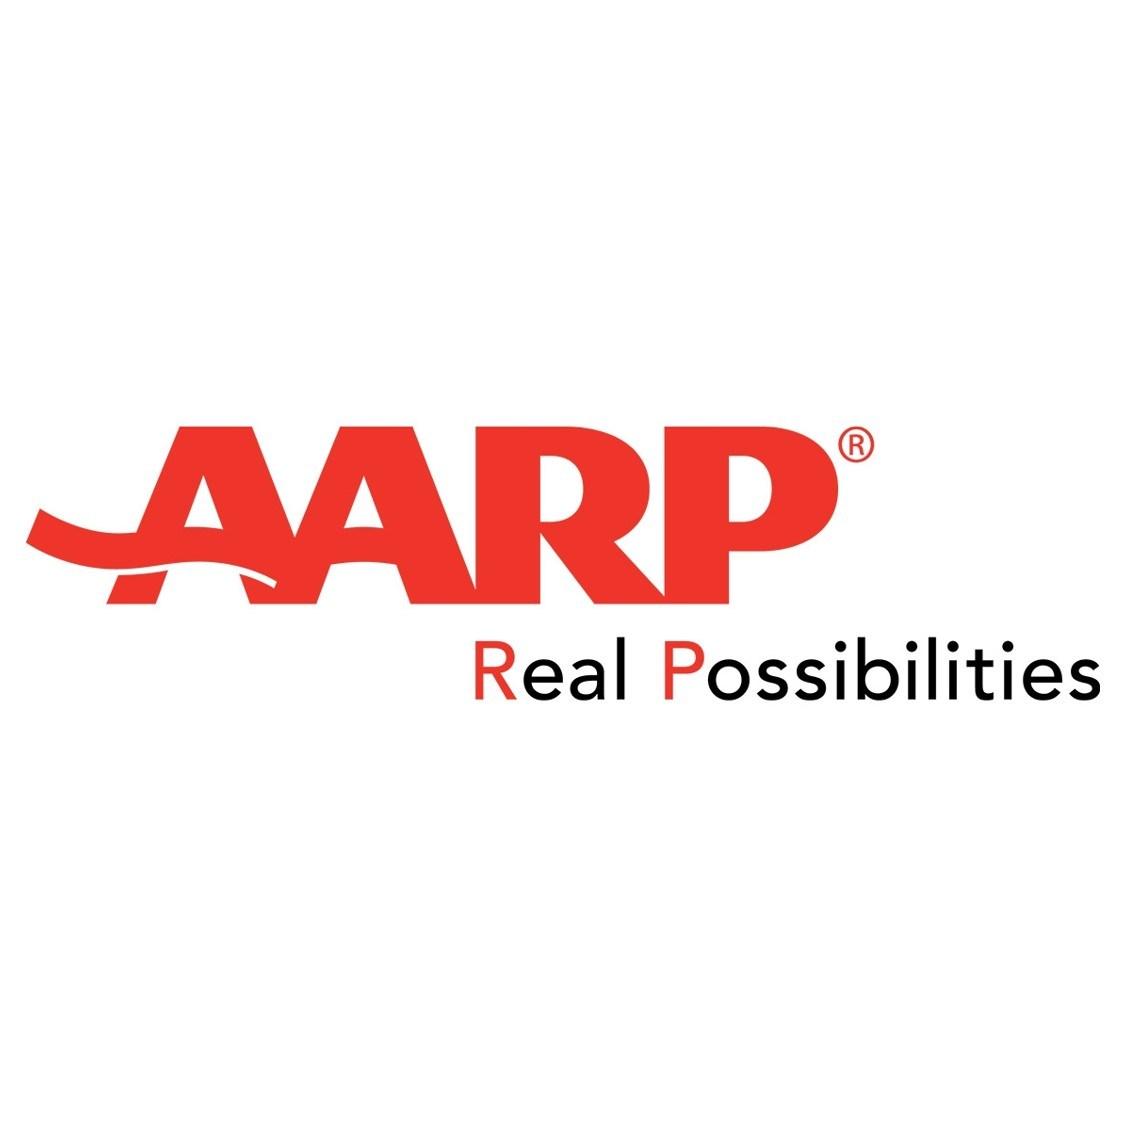 How many aarp members